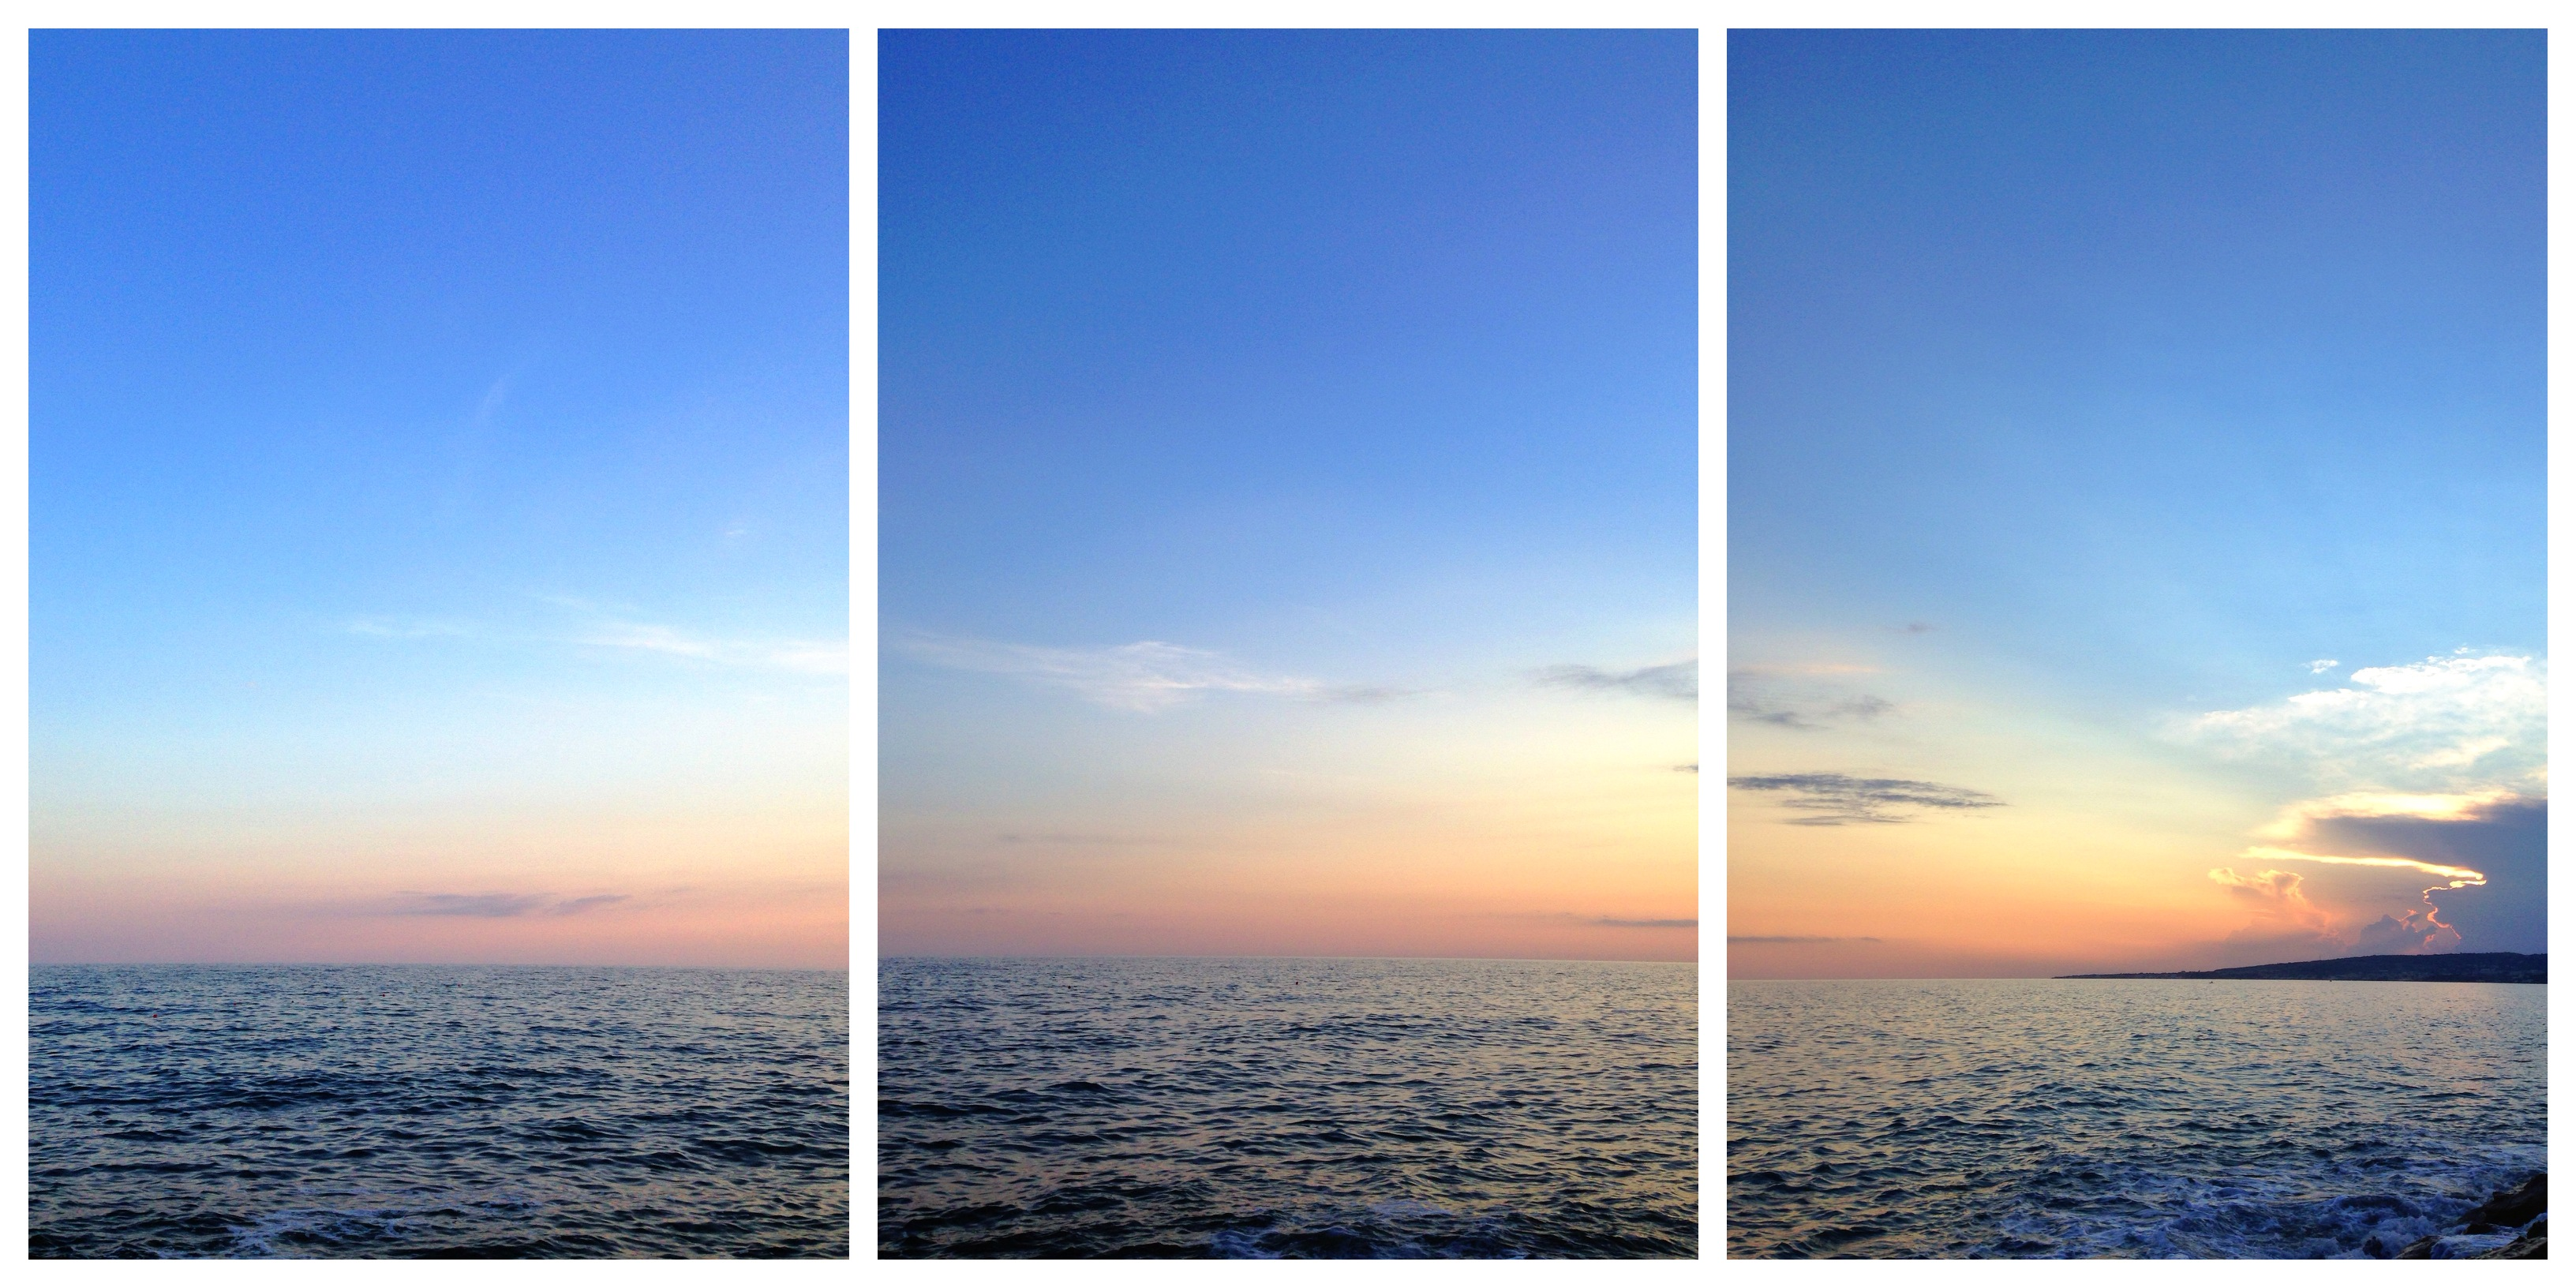 26 Luglio 2014 | 26th of July